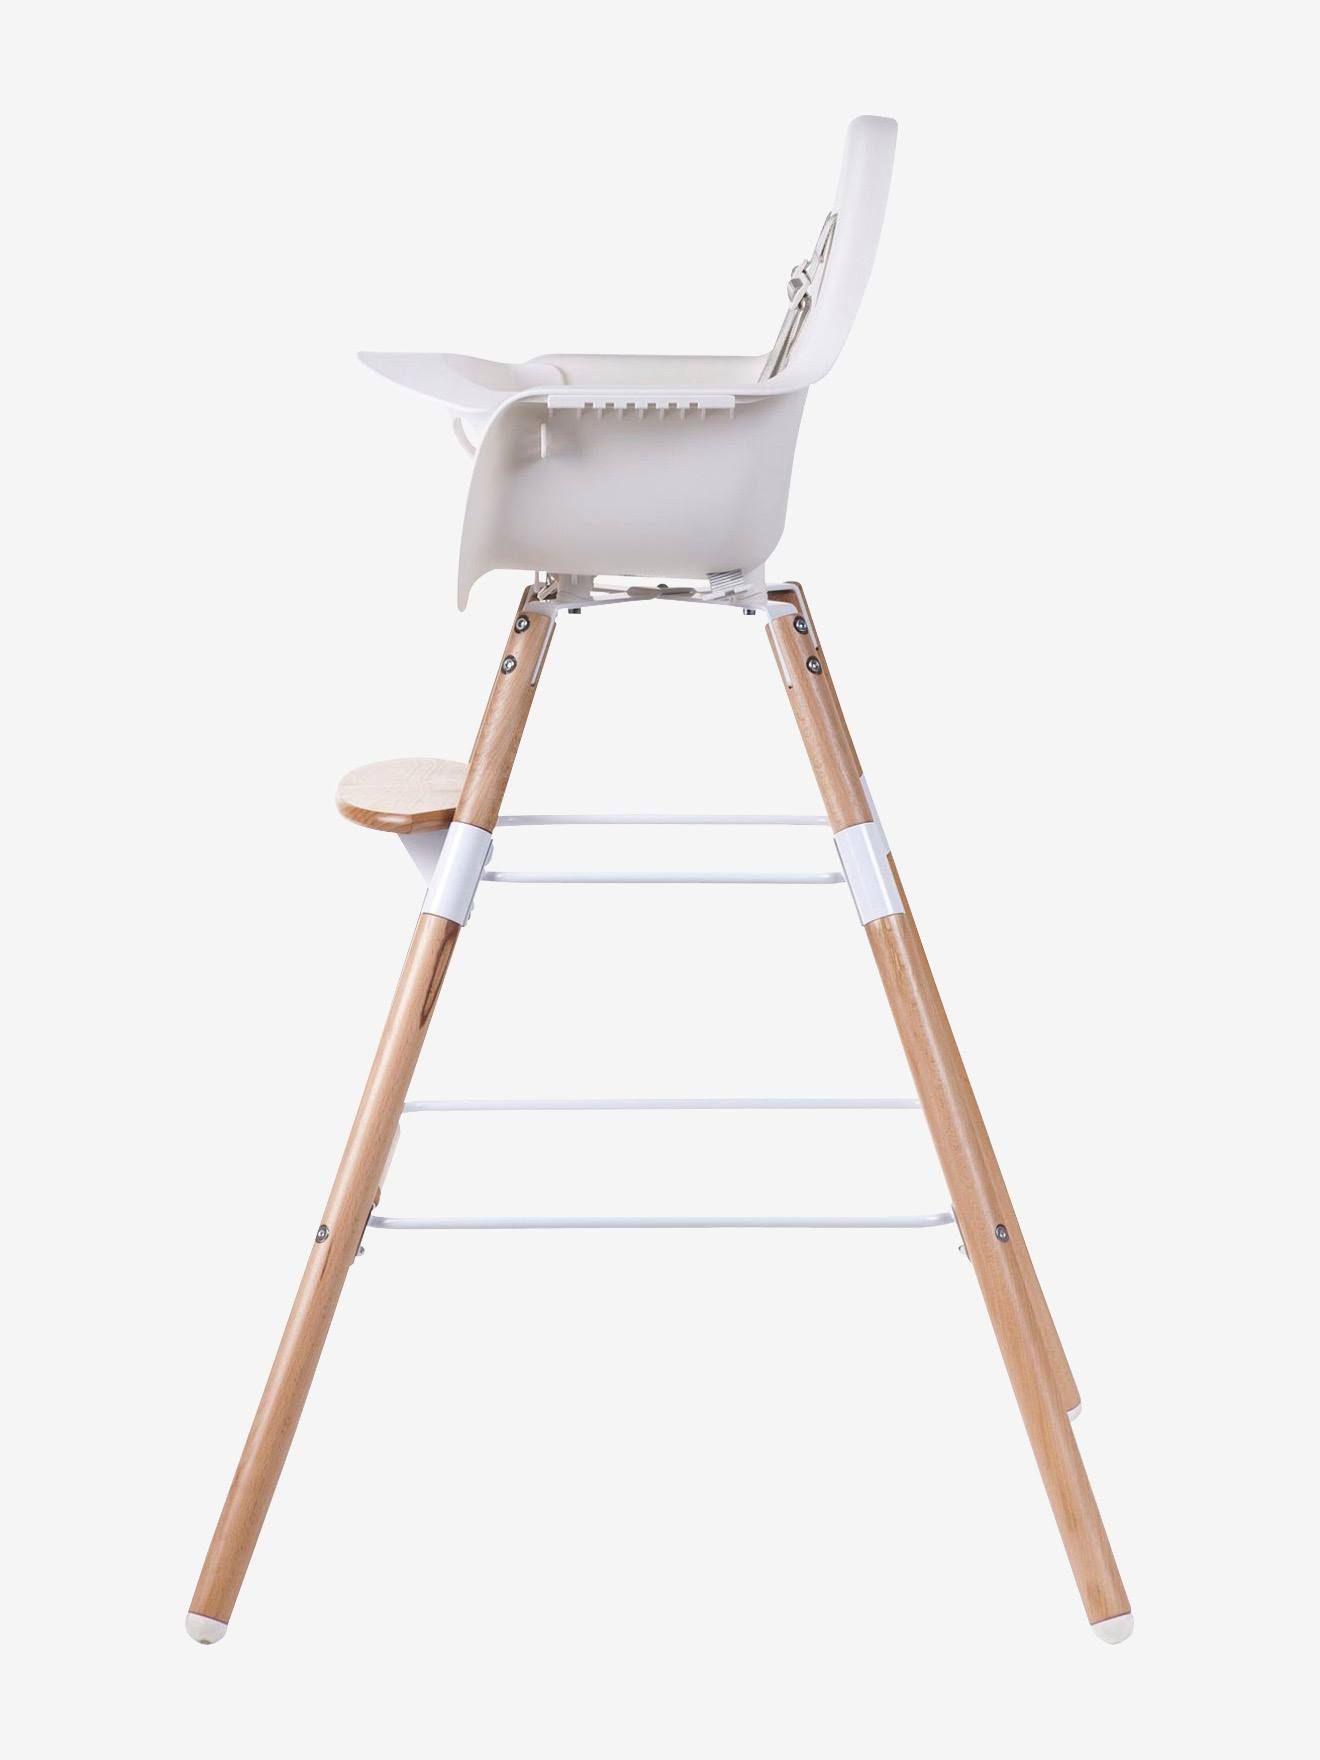 Kit de pieds longs pour chaise haute Evolu + repose pieds CHILDHOME naturel